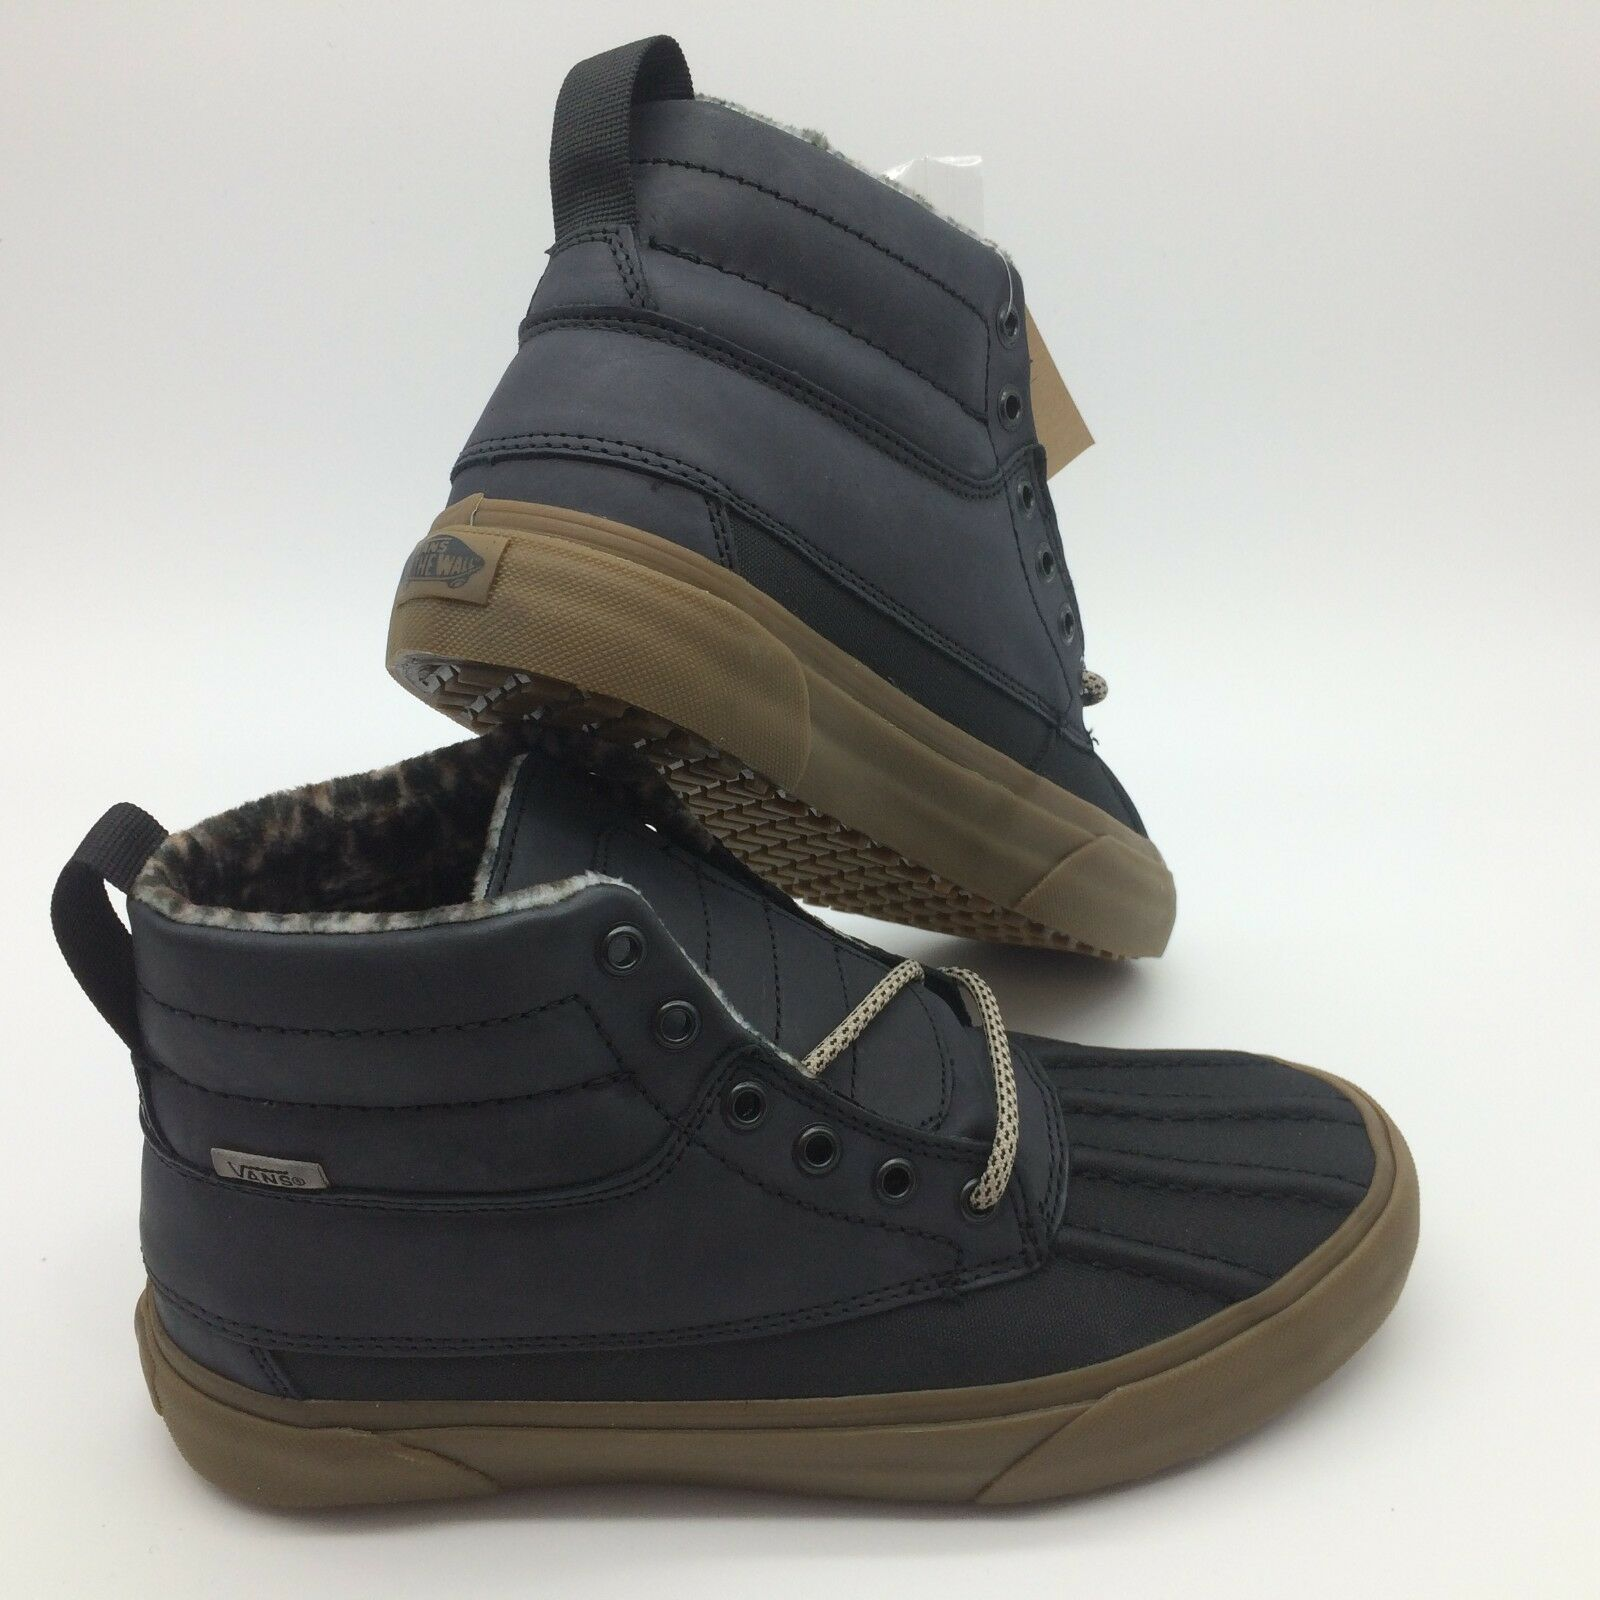 Vans Uomo M Shoes